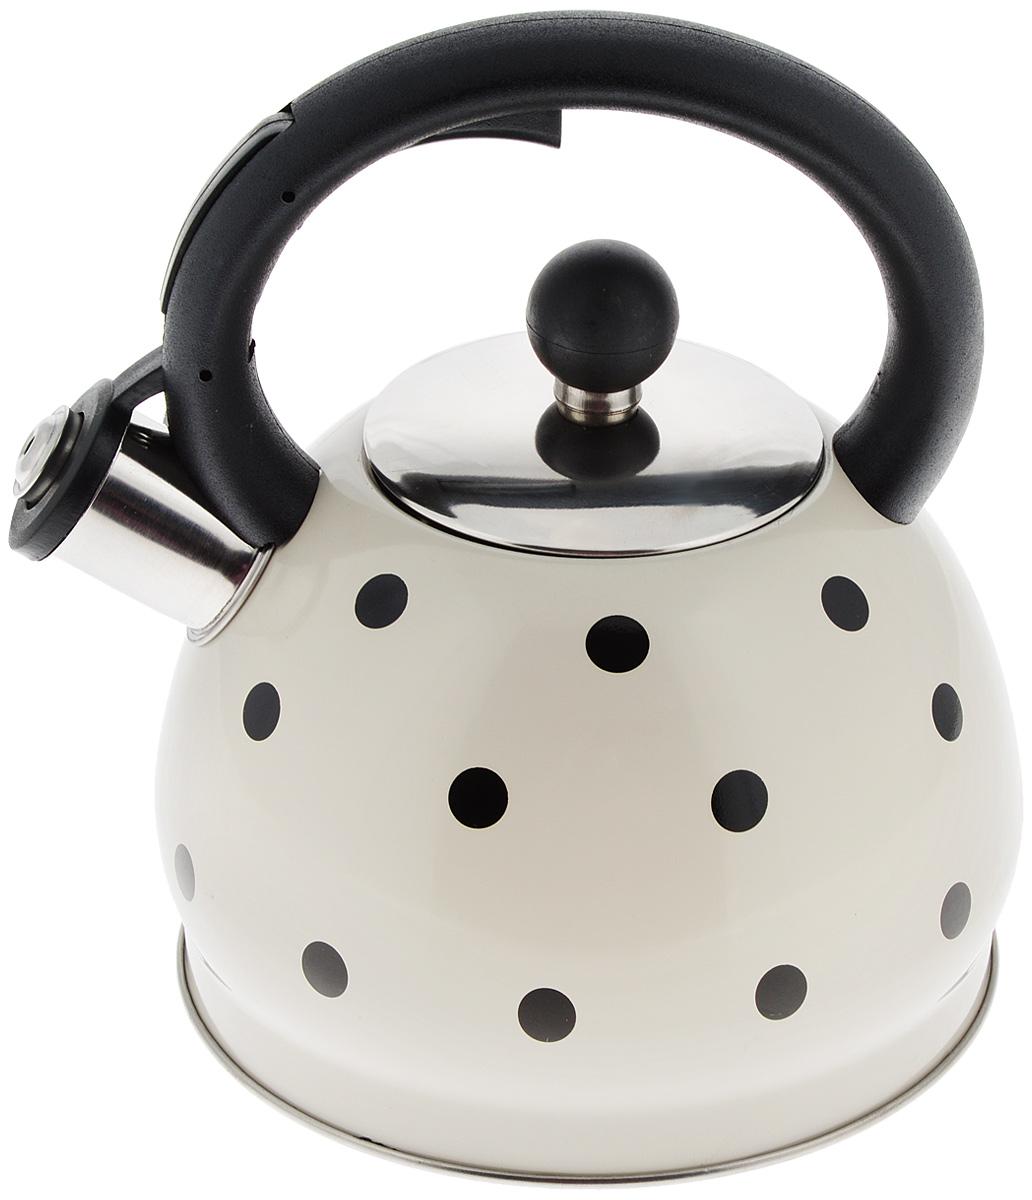 Чайник Hoffmann, со свистком, цвет: бежевый, 2 л. HM 5528/1HM 5528/1